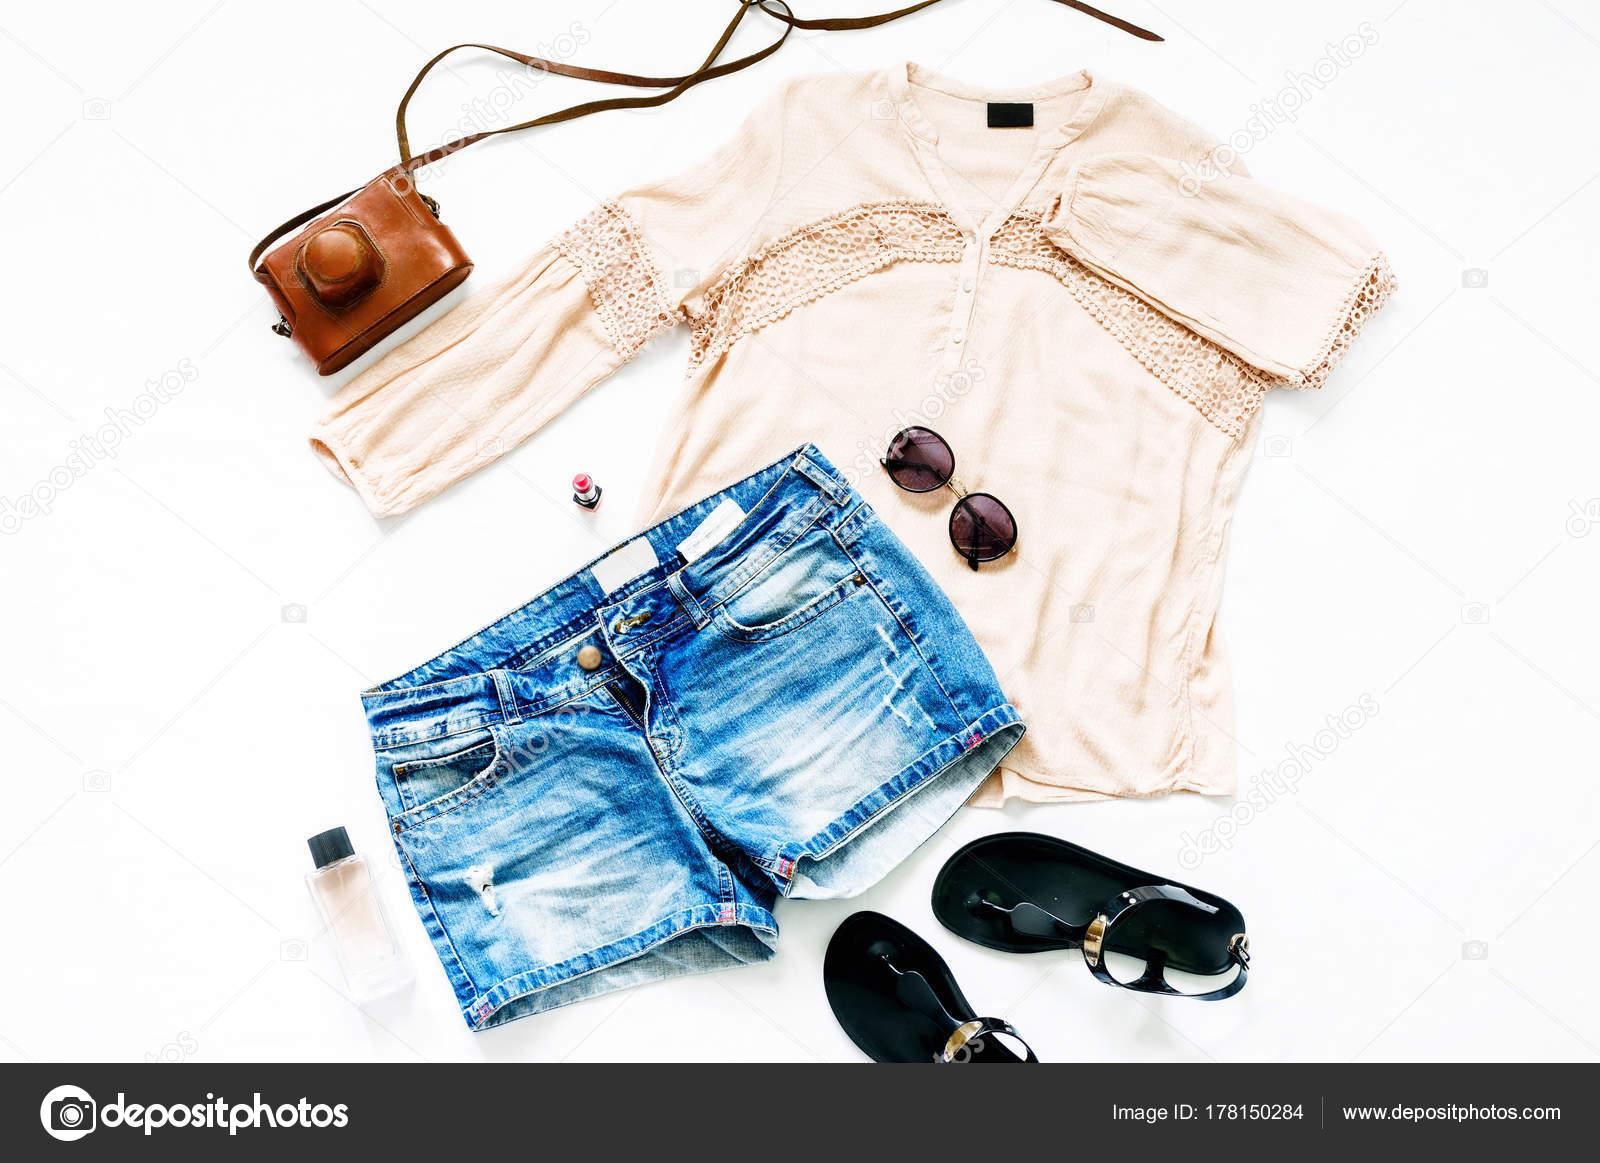 5cc98595e6cf Καλοκαιρινό Σετ Γυναικεία Ρούχα Άσπρο Φόντο Γυναικεία Τζιν Σορτς Μπλούζα–  εικόνα αρχείου